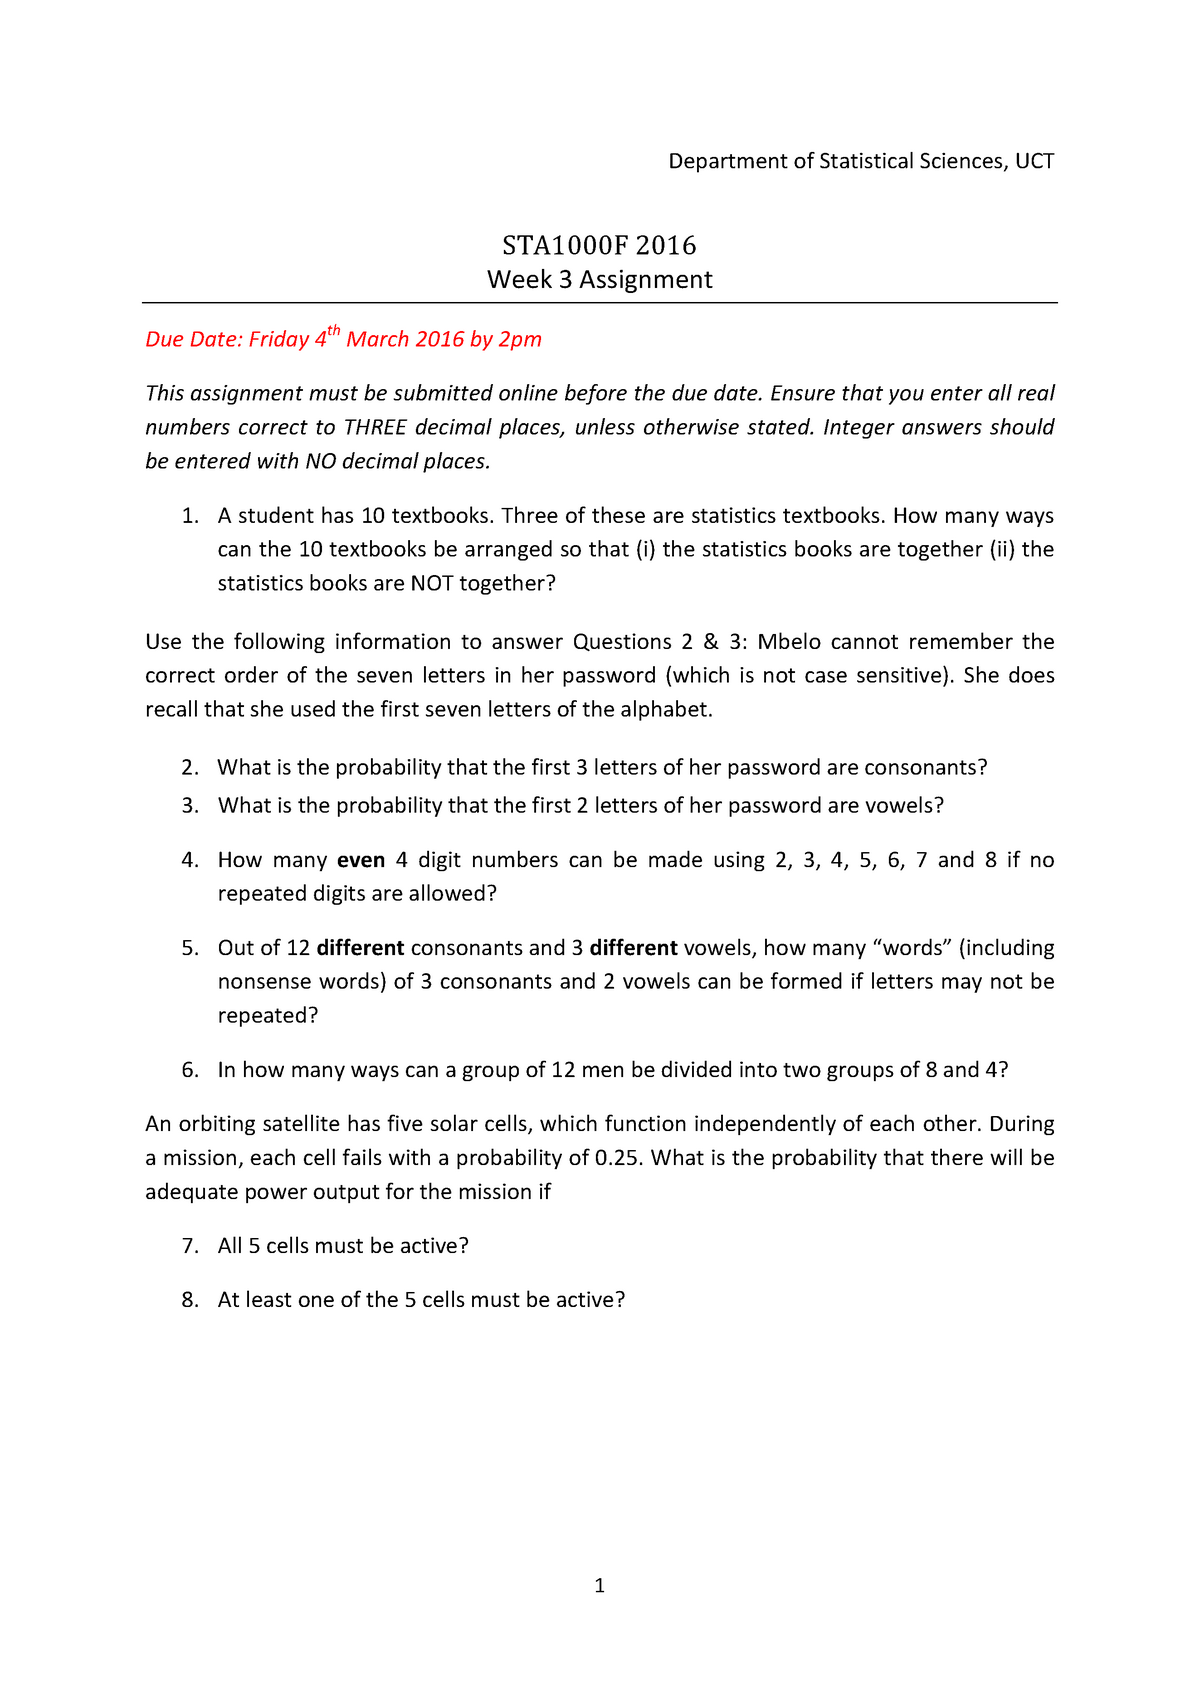 Assignment+3+NO+Answers+STA1000F+2016-1 - STA1000F